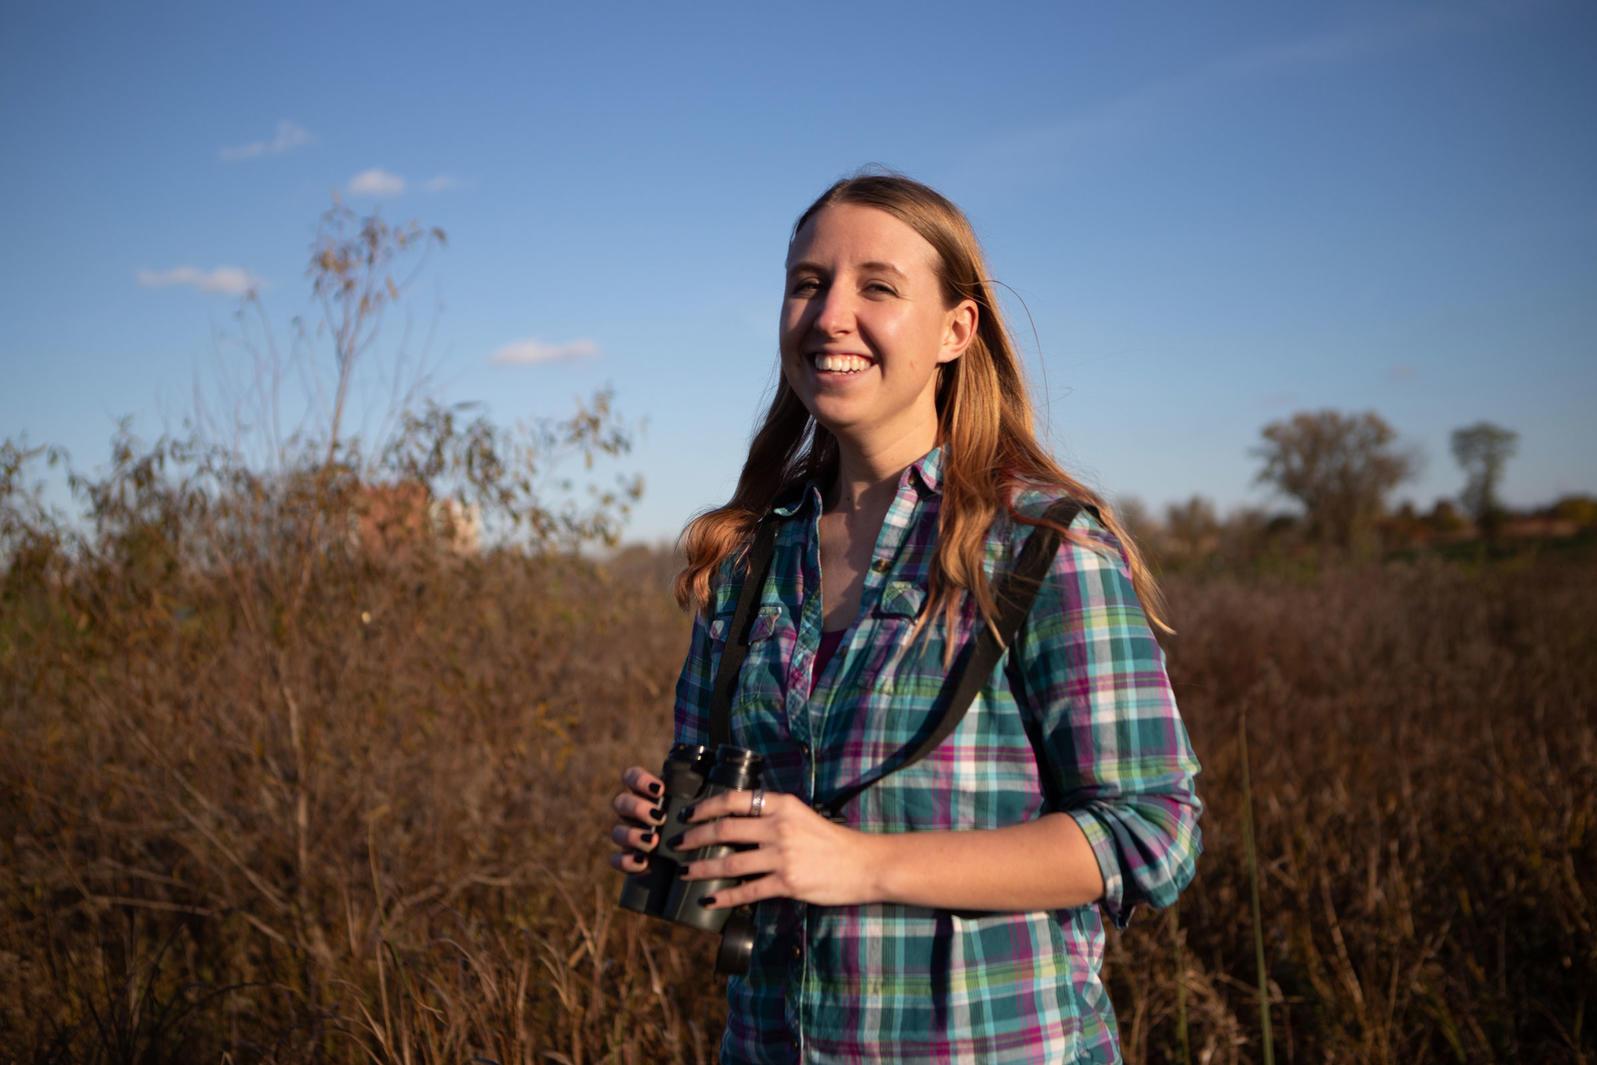 Sarah Winnicki, a longtime member and continued mentor of the Ohio Young Birders Club. Camilla Cerea/Audubon